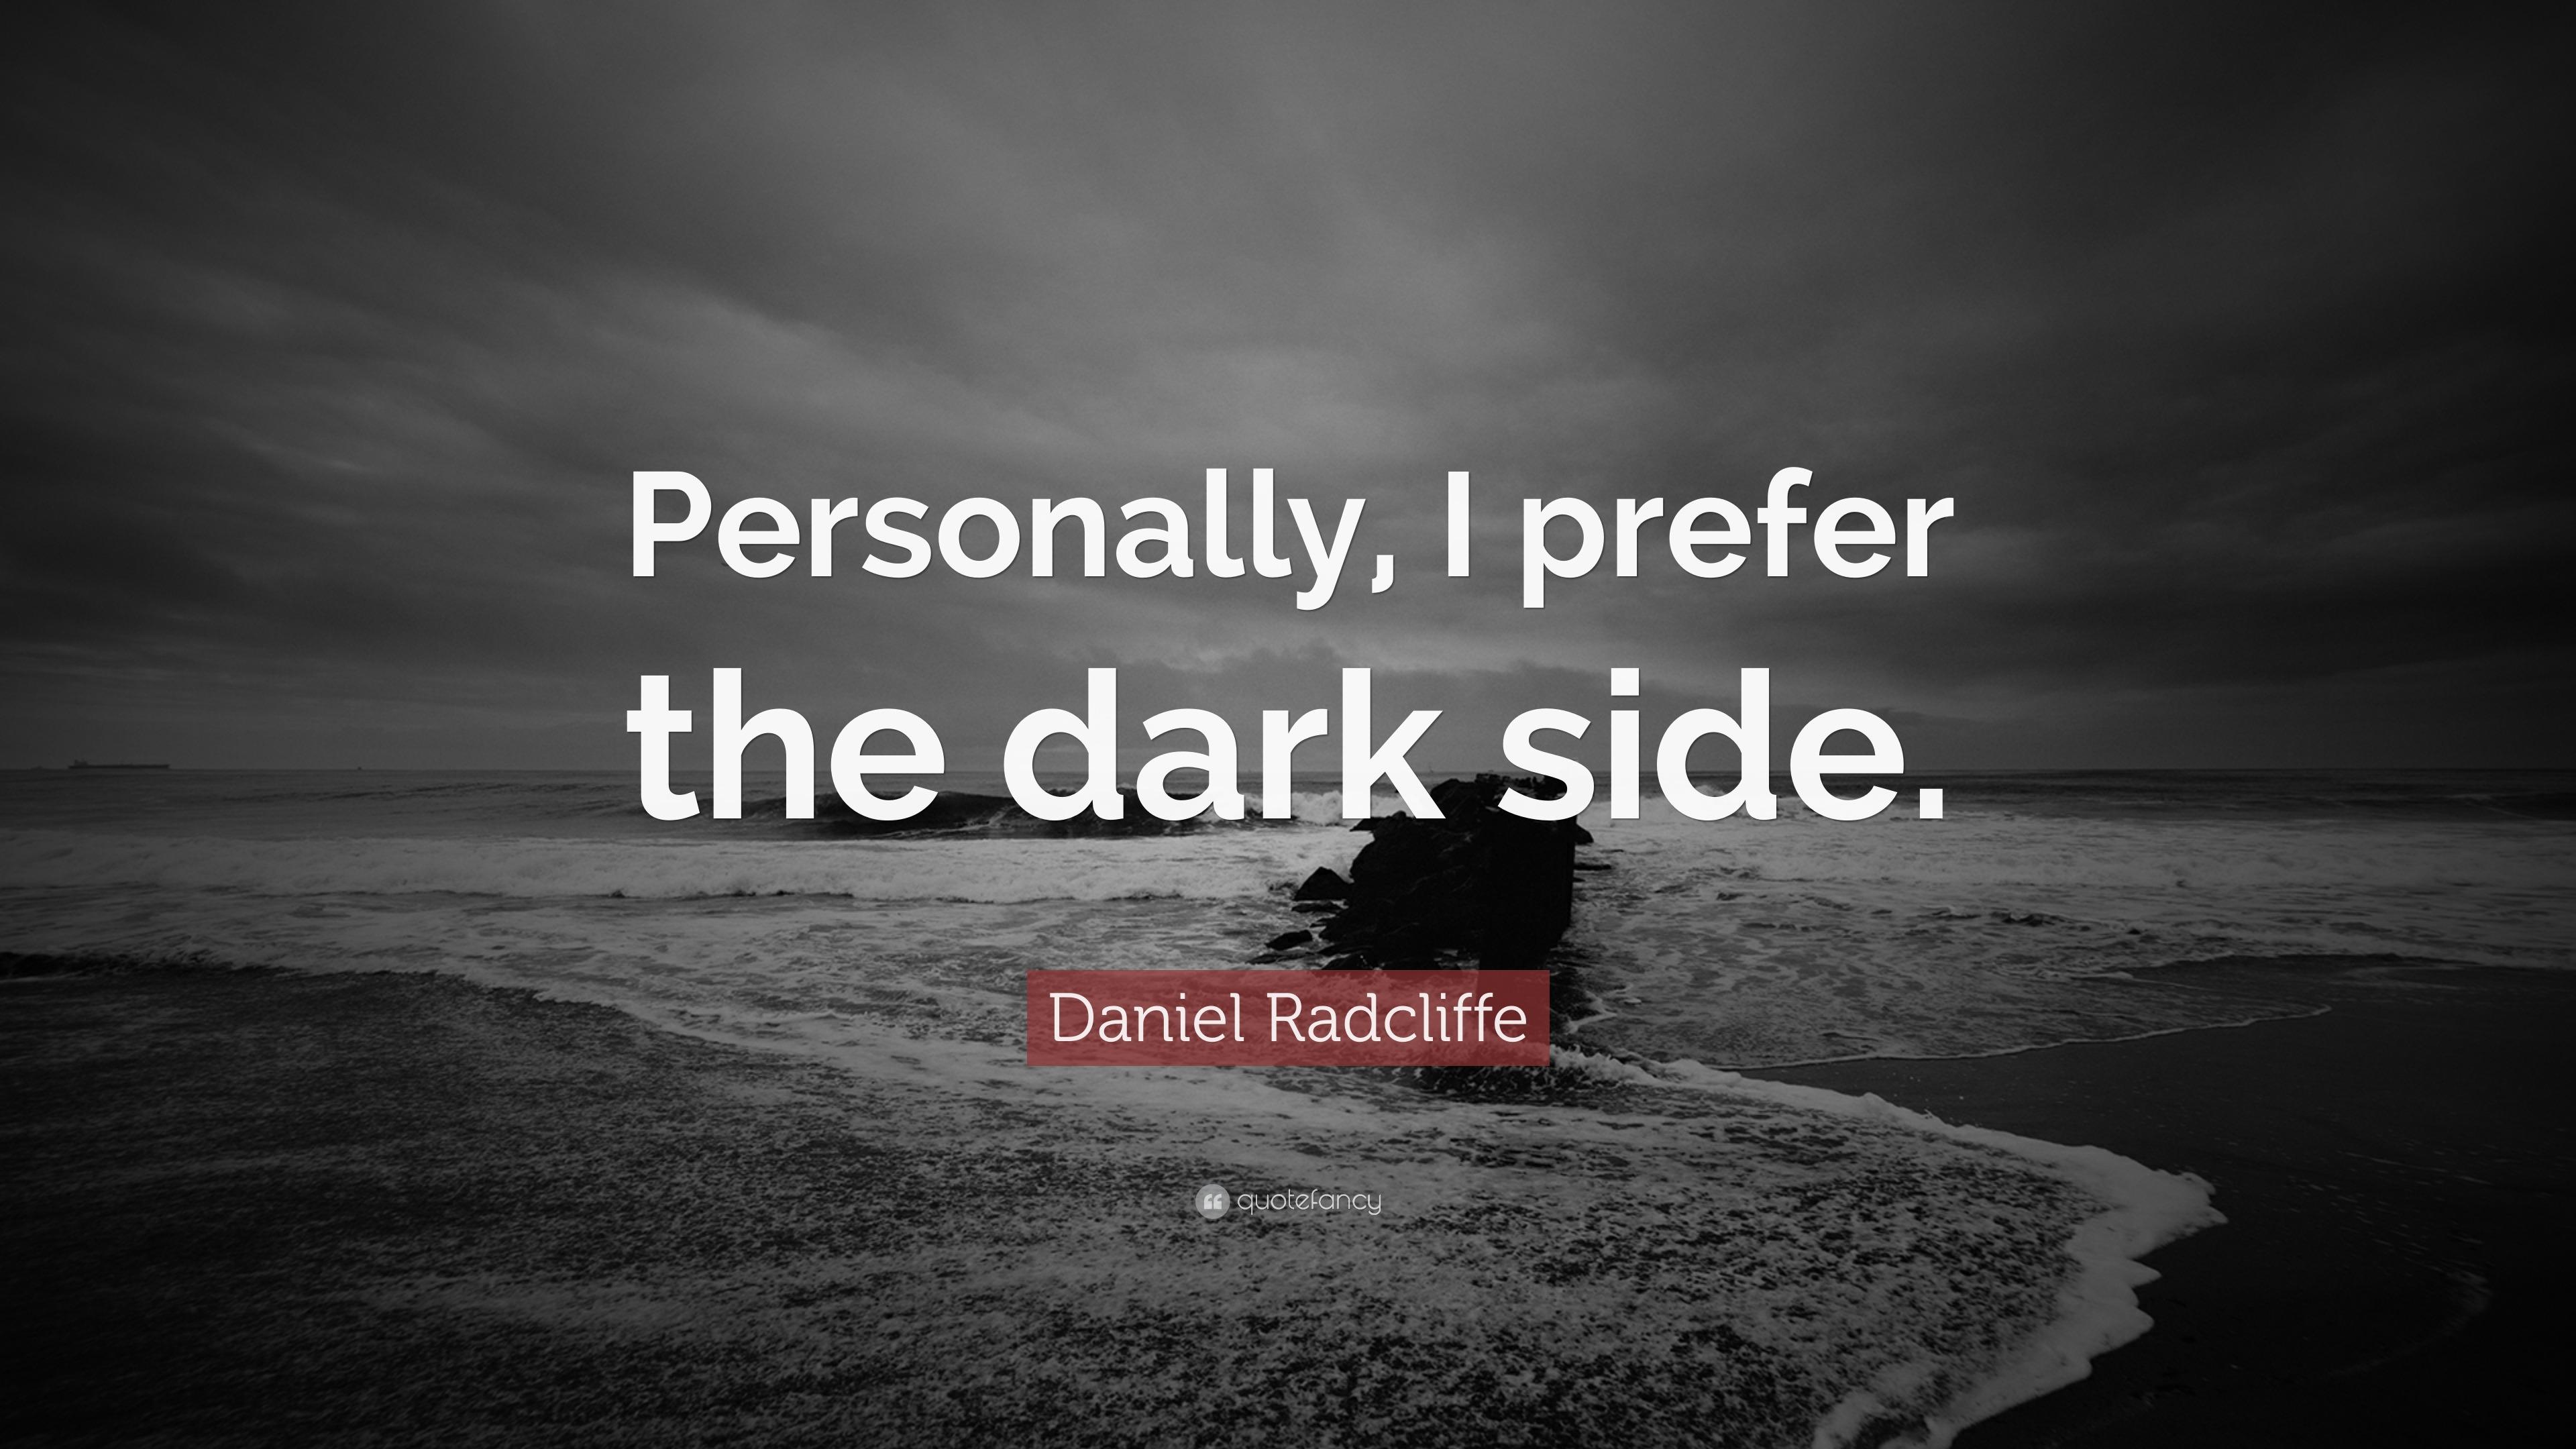 Dark side of danielle 1976 - 1 5